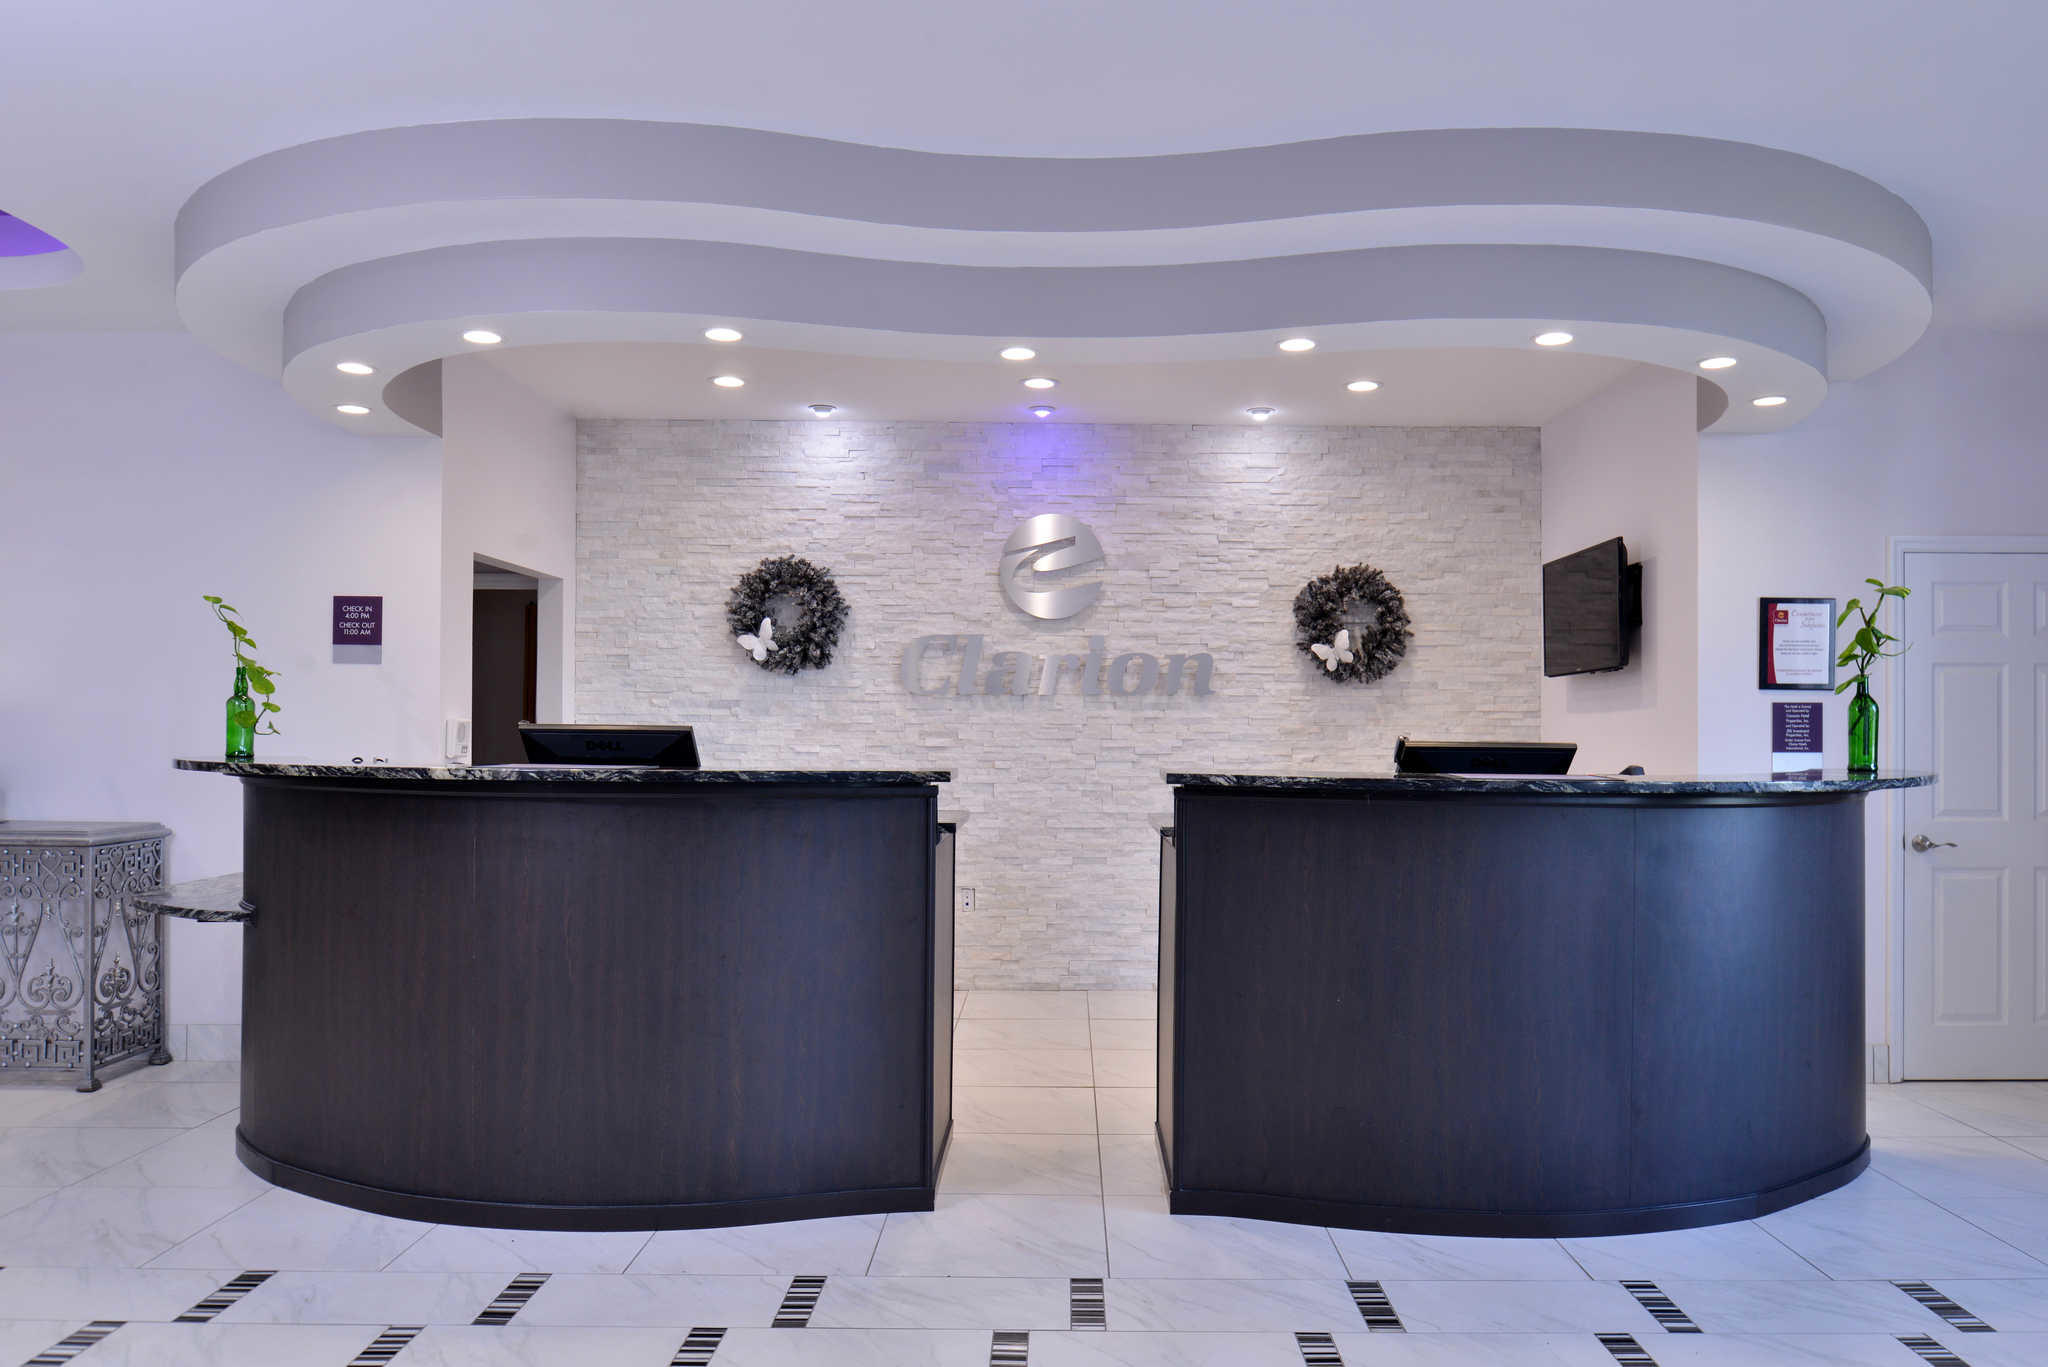 Clarion Inn & Suites Orlando near Theme Parks image 5